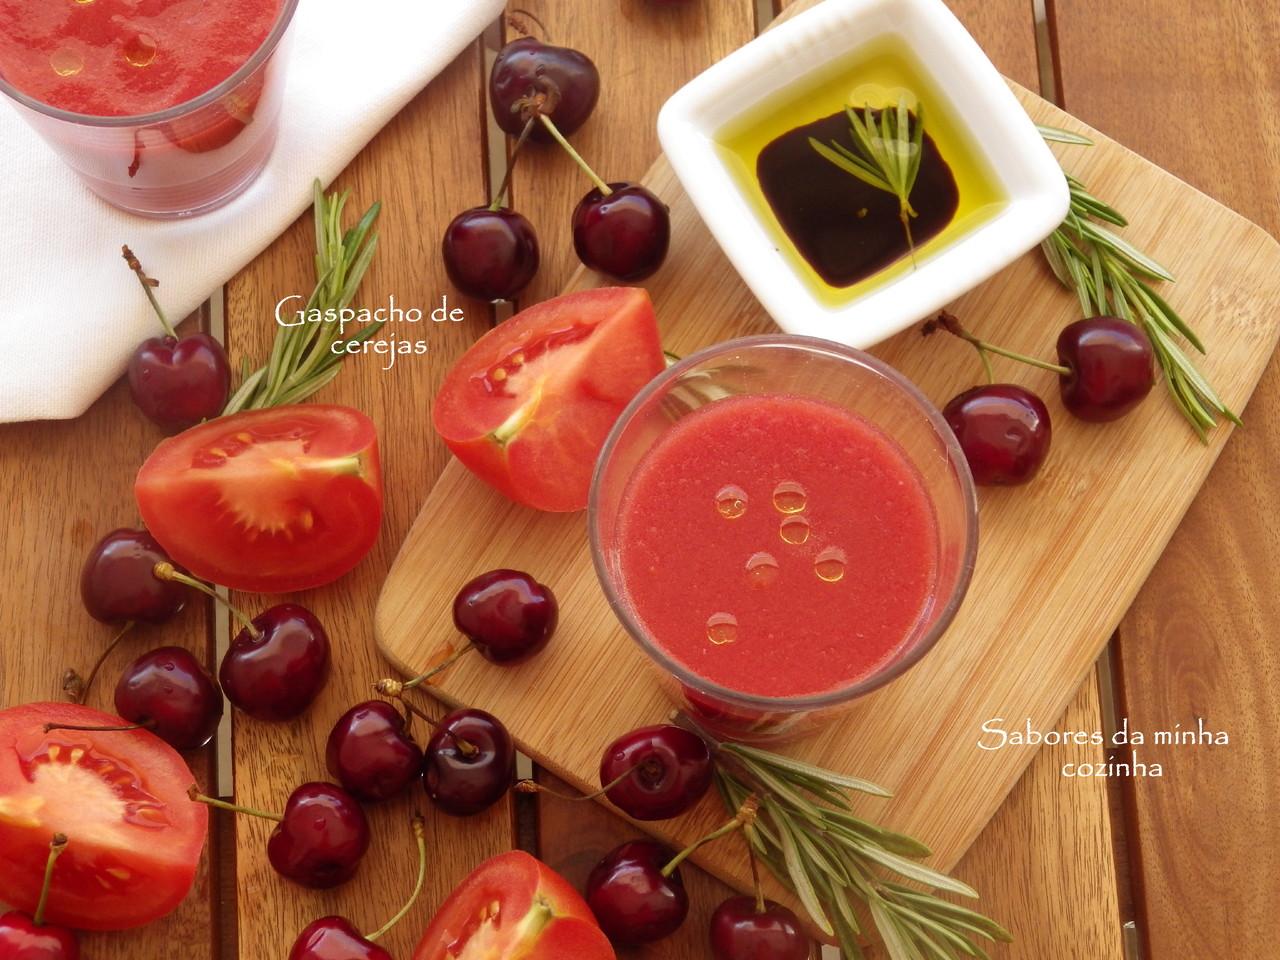 IMGP4806-Gaspacho de cerejas-Blog.JPG